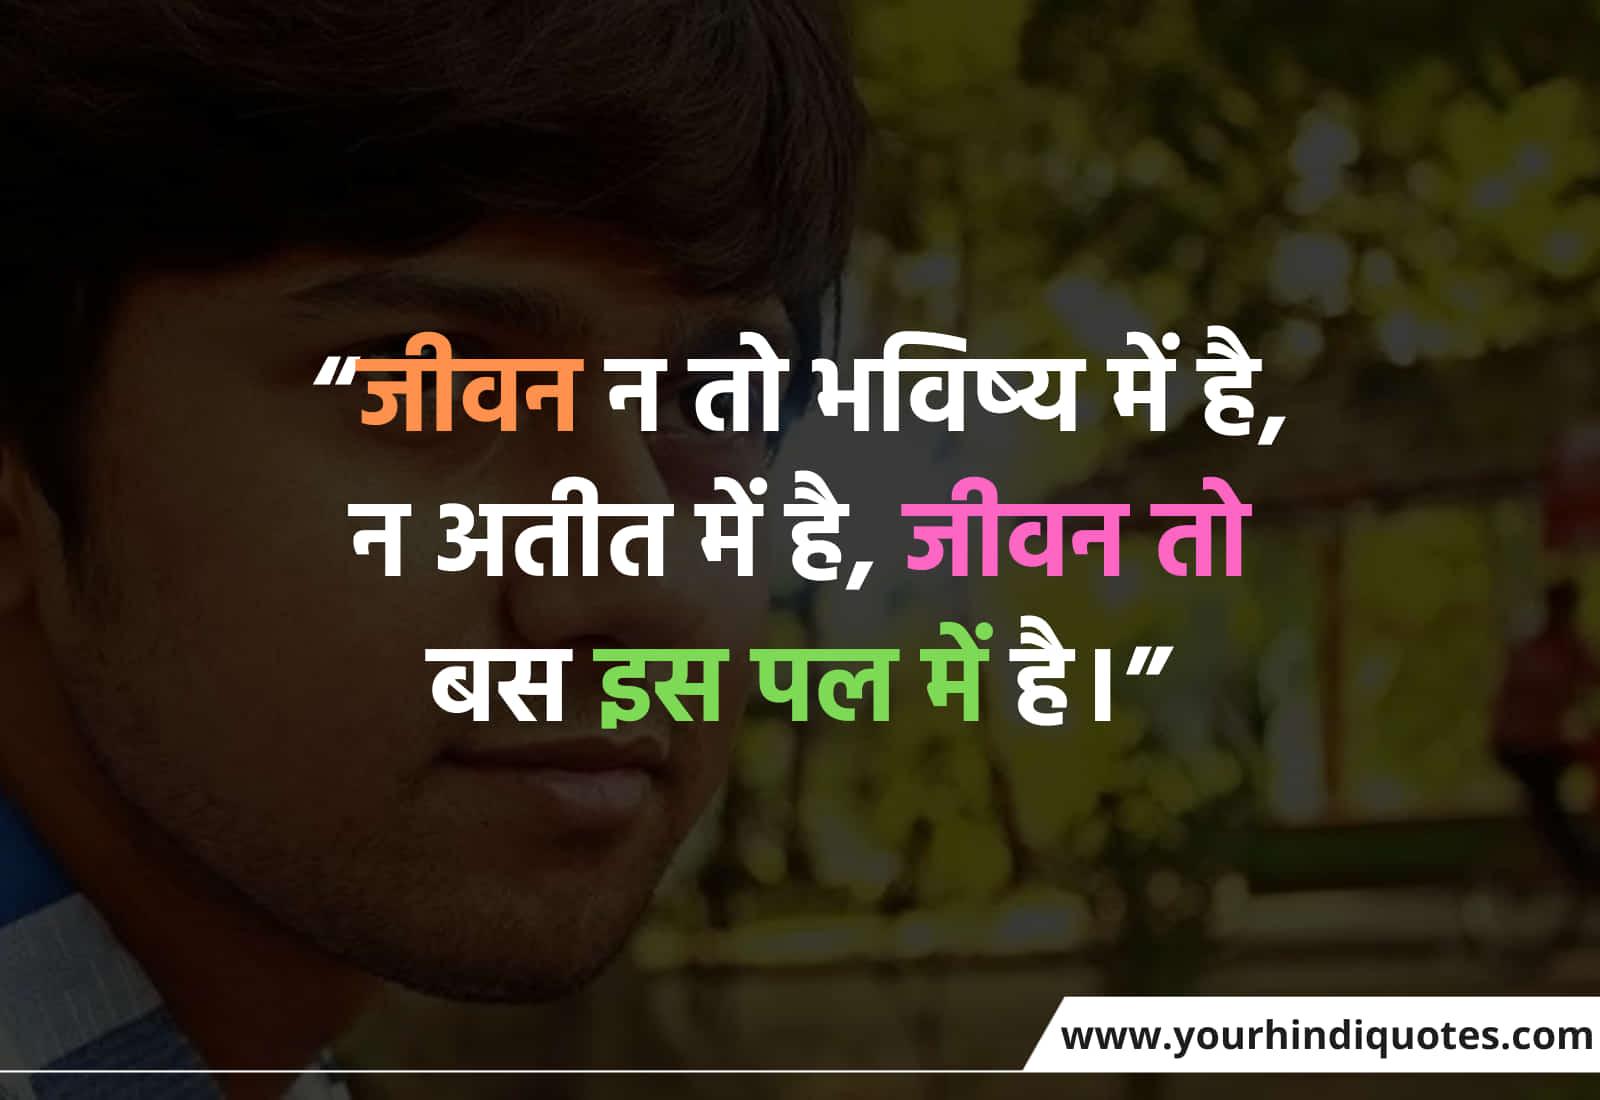 Bhagwat Gita Life Quotes Hindi